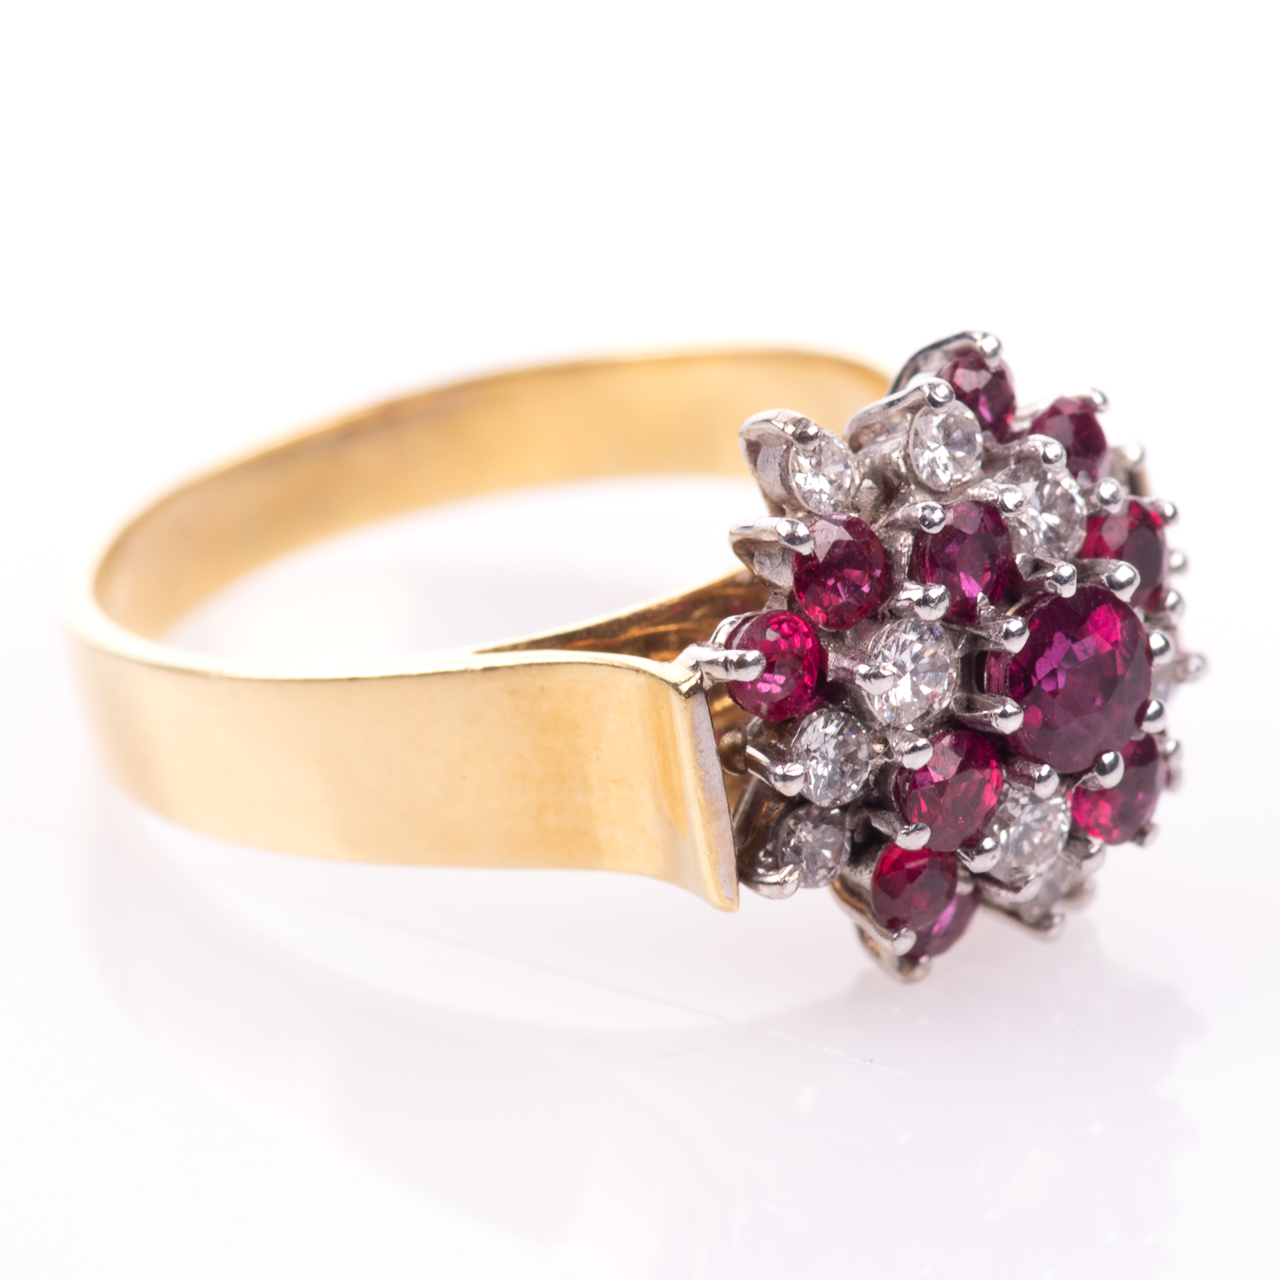 18ct Gold Ruby & 0.35ct Diamond Cluster Ring Hallmarked Birmingham - Image 7 of 7